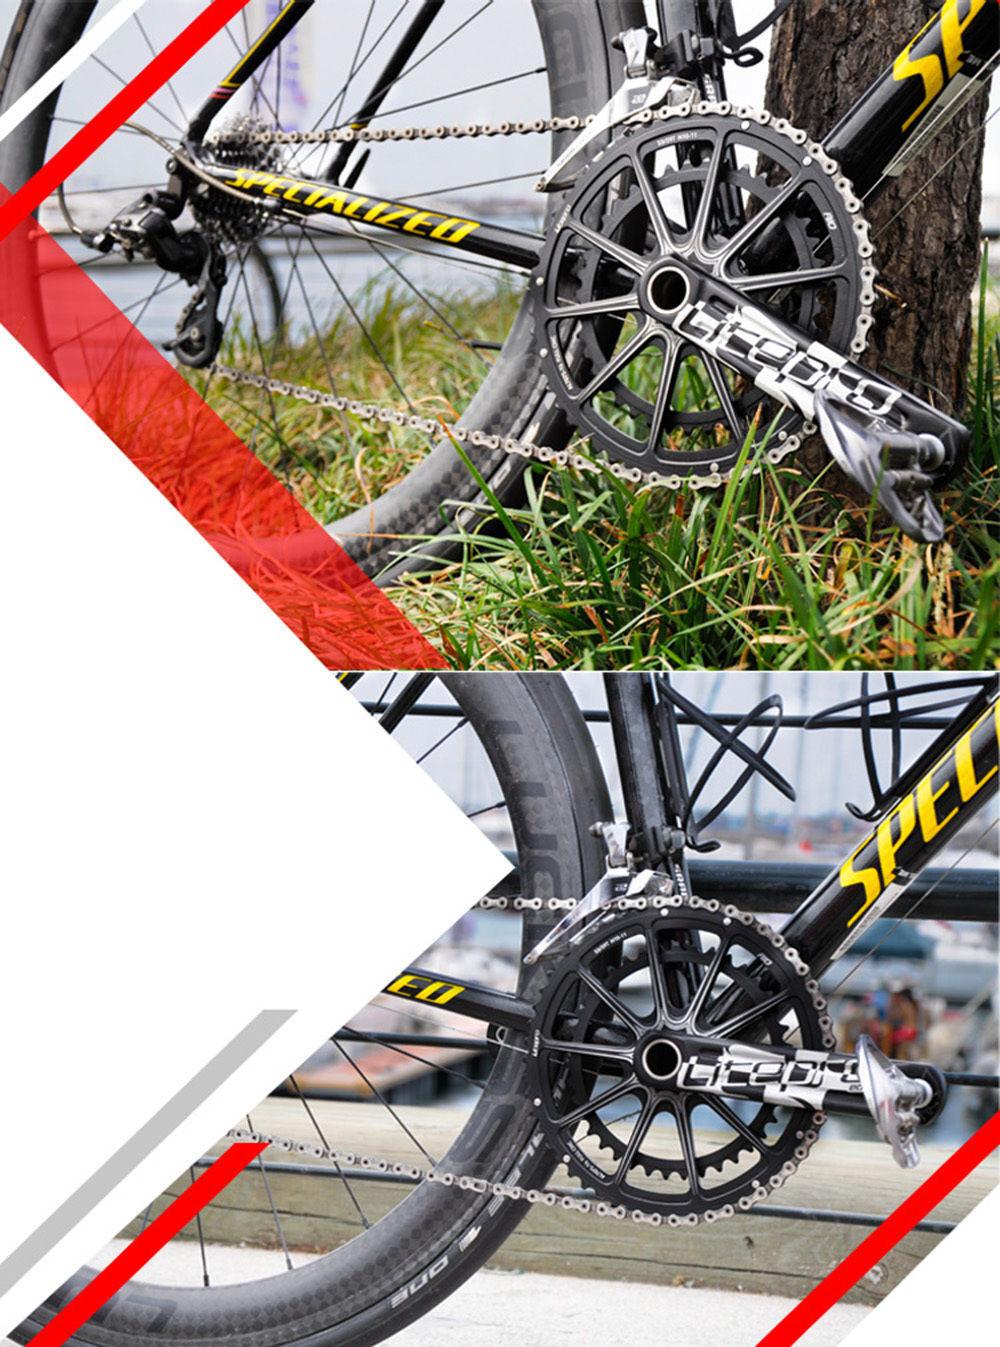 Litepro EDGE Hollow Double Crankset BCD  130mm GXP BB Road 53T 39T Folding Bike  welcome to choose